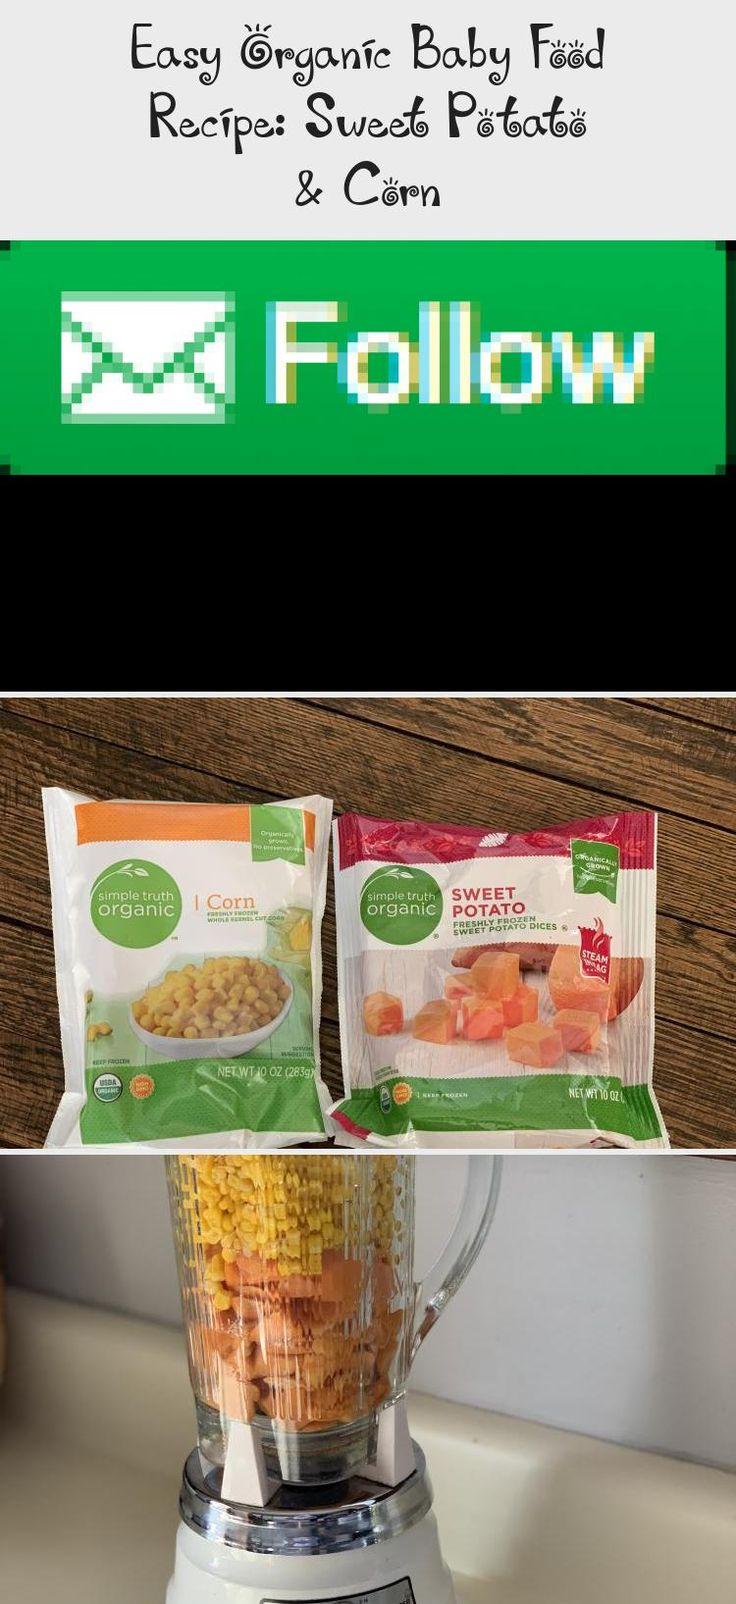 Easy Organic Baby Food Recipe: Sweet Potato & Corn - BABY ...